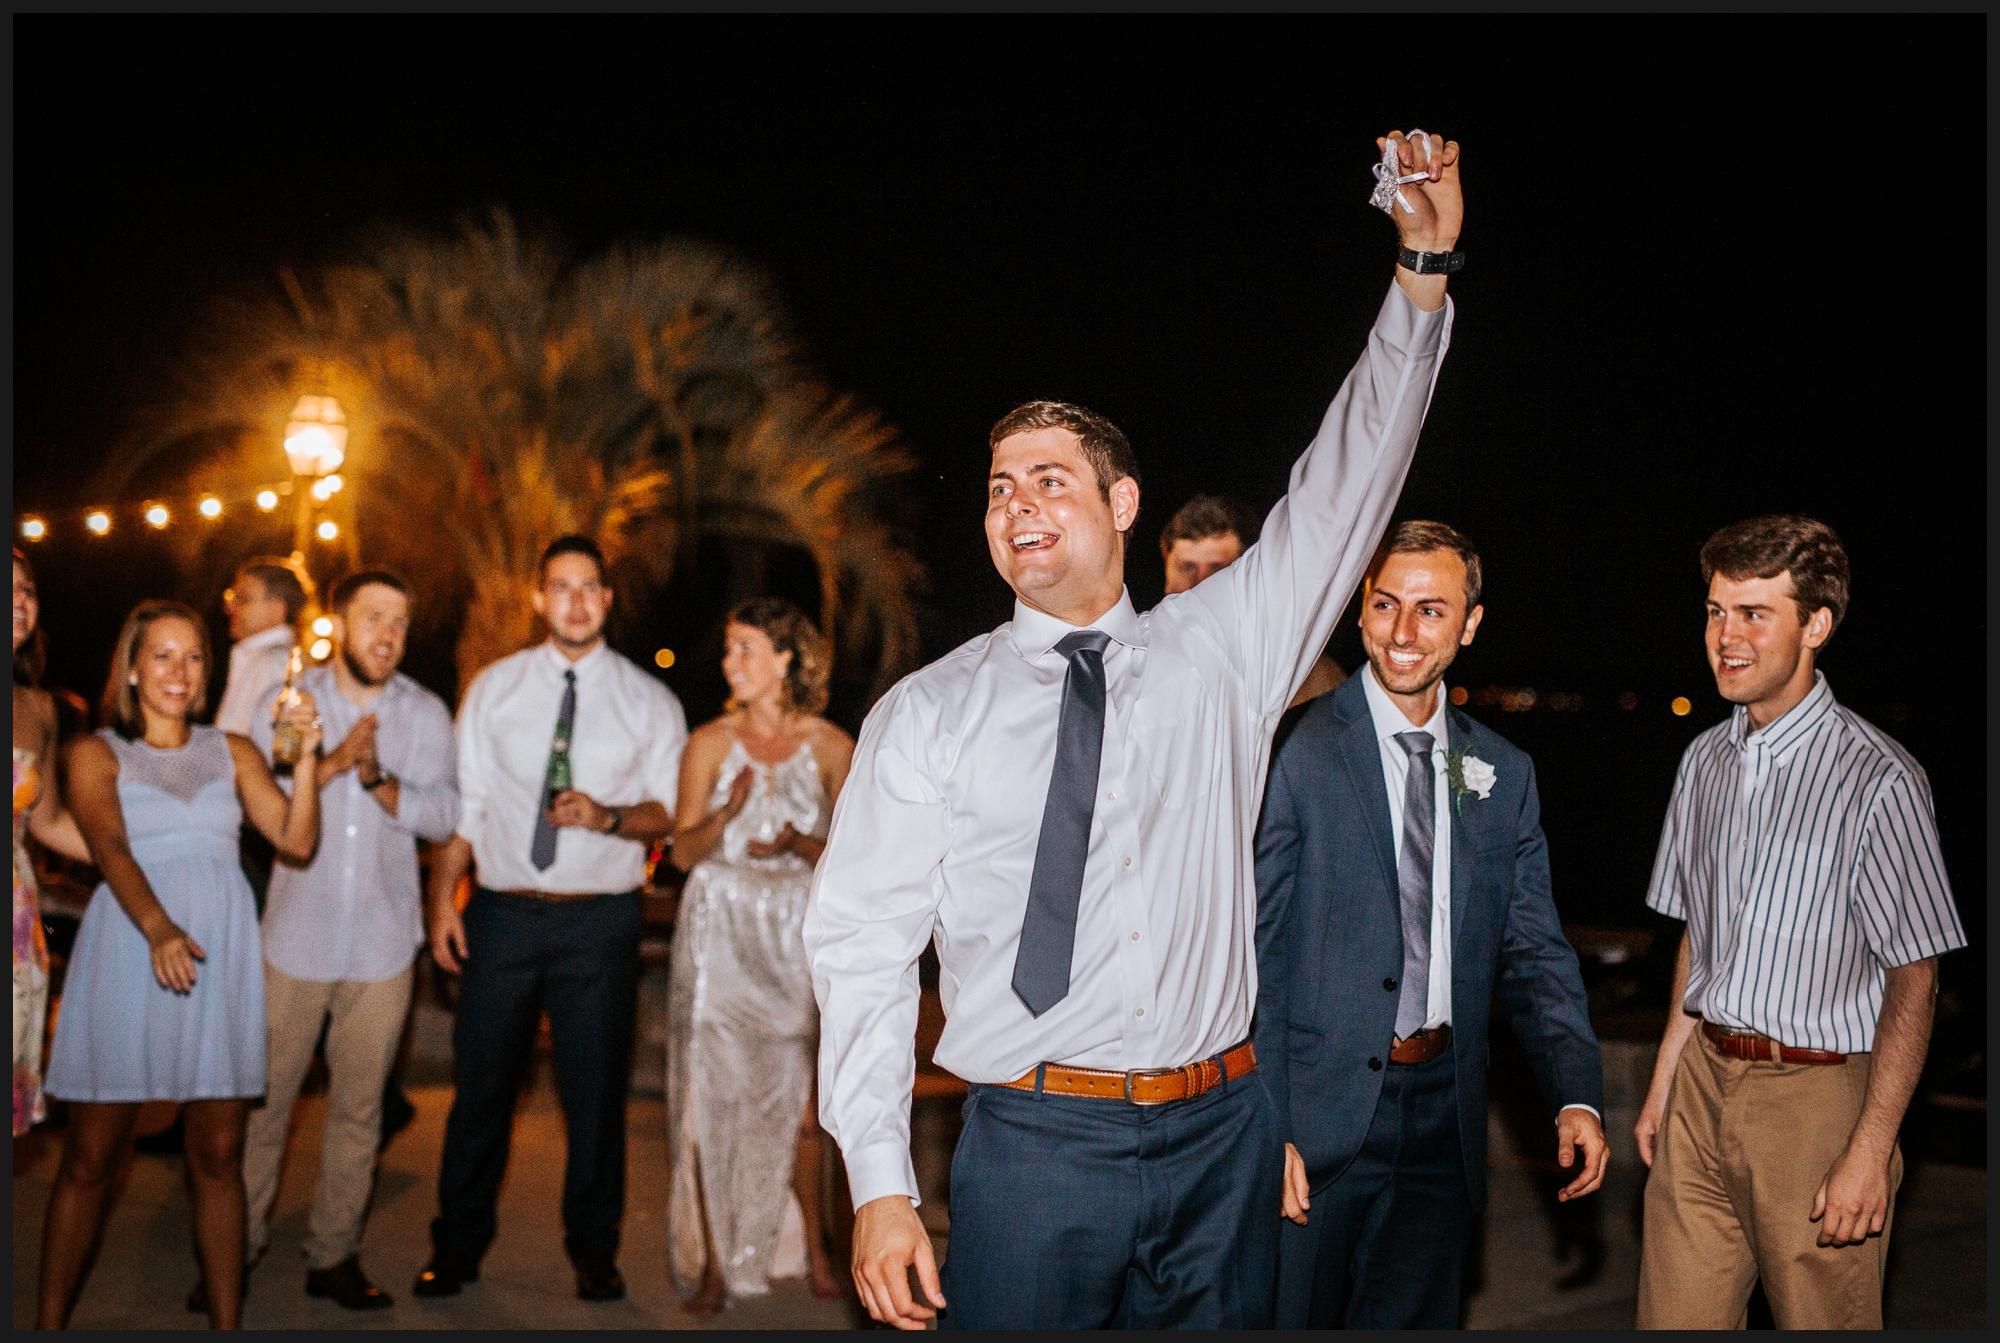 Orlando-Wedding-Photographer-destination-wedding-photographer-florida-wedding-photographer-bohemian-wedding-photographer_0134.jpg